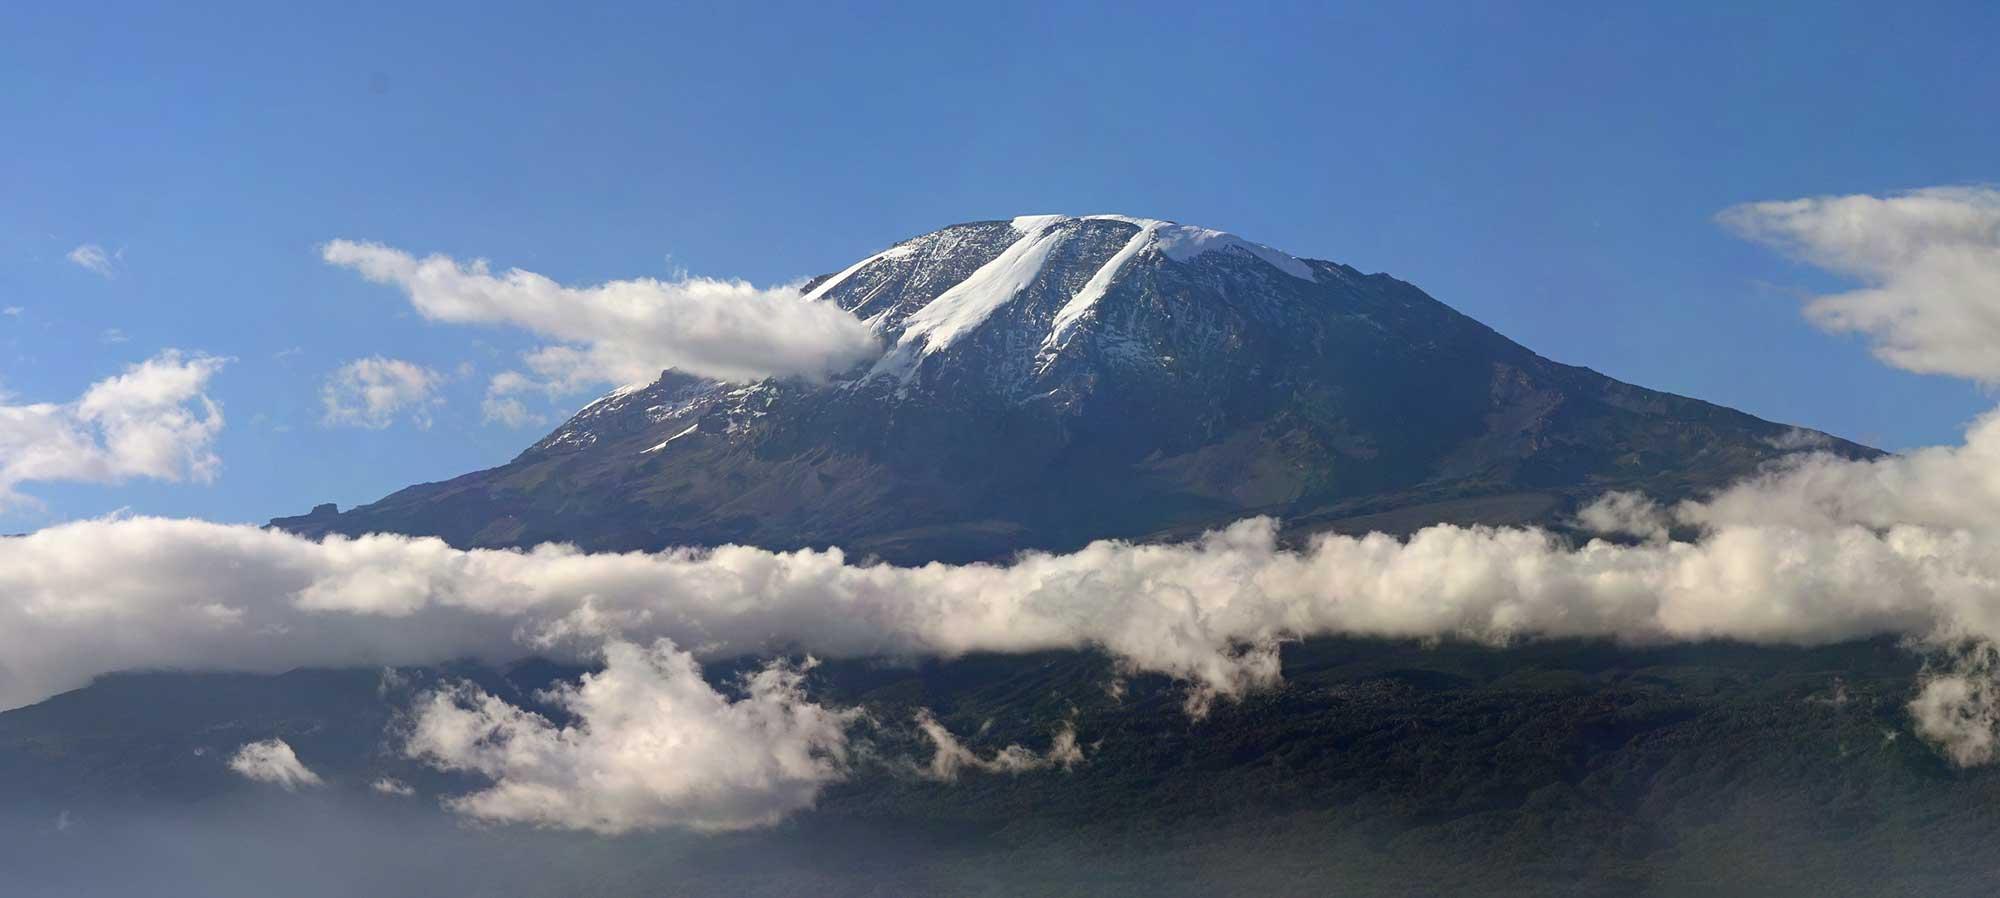 clouds over kilimanjaro